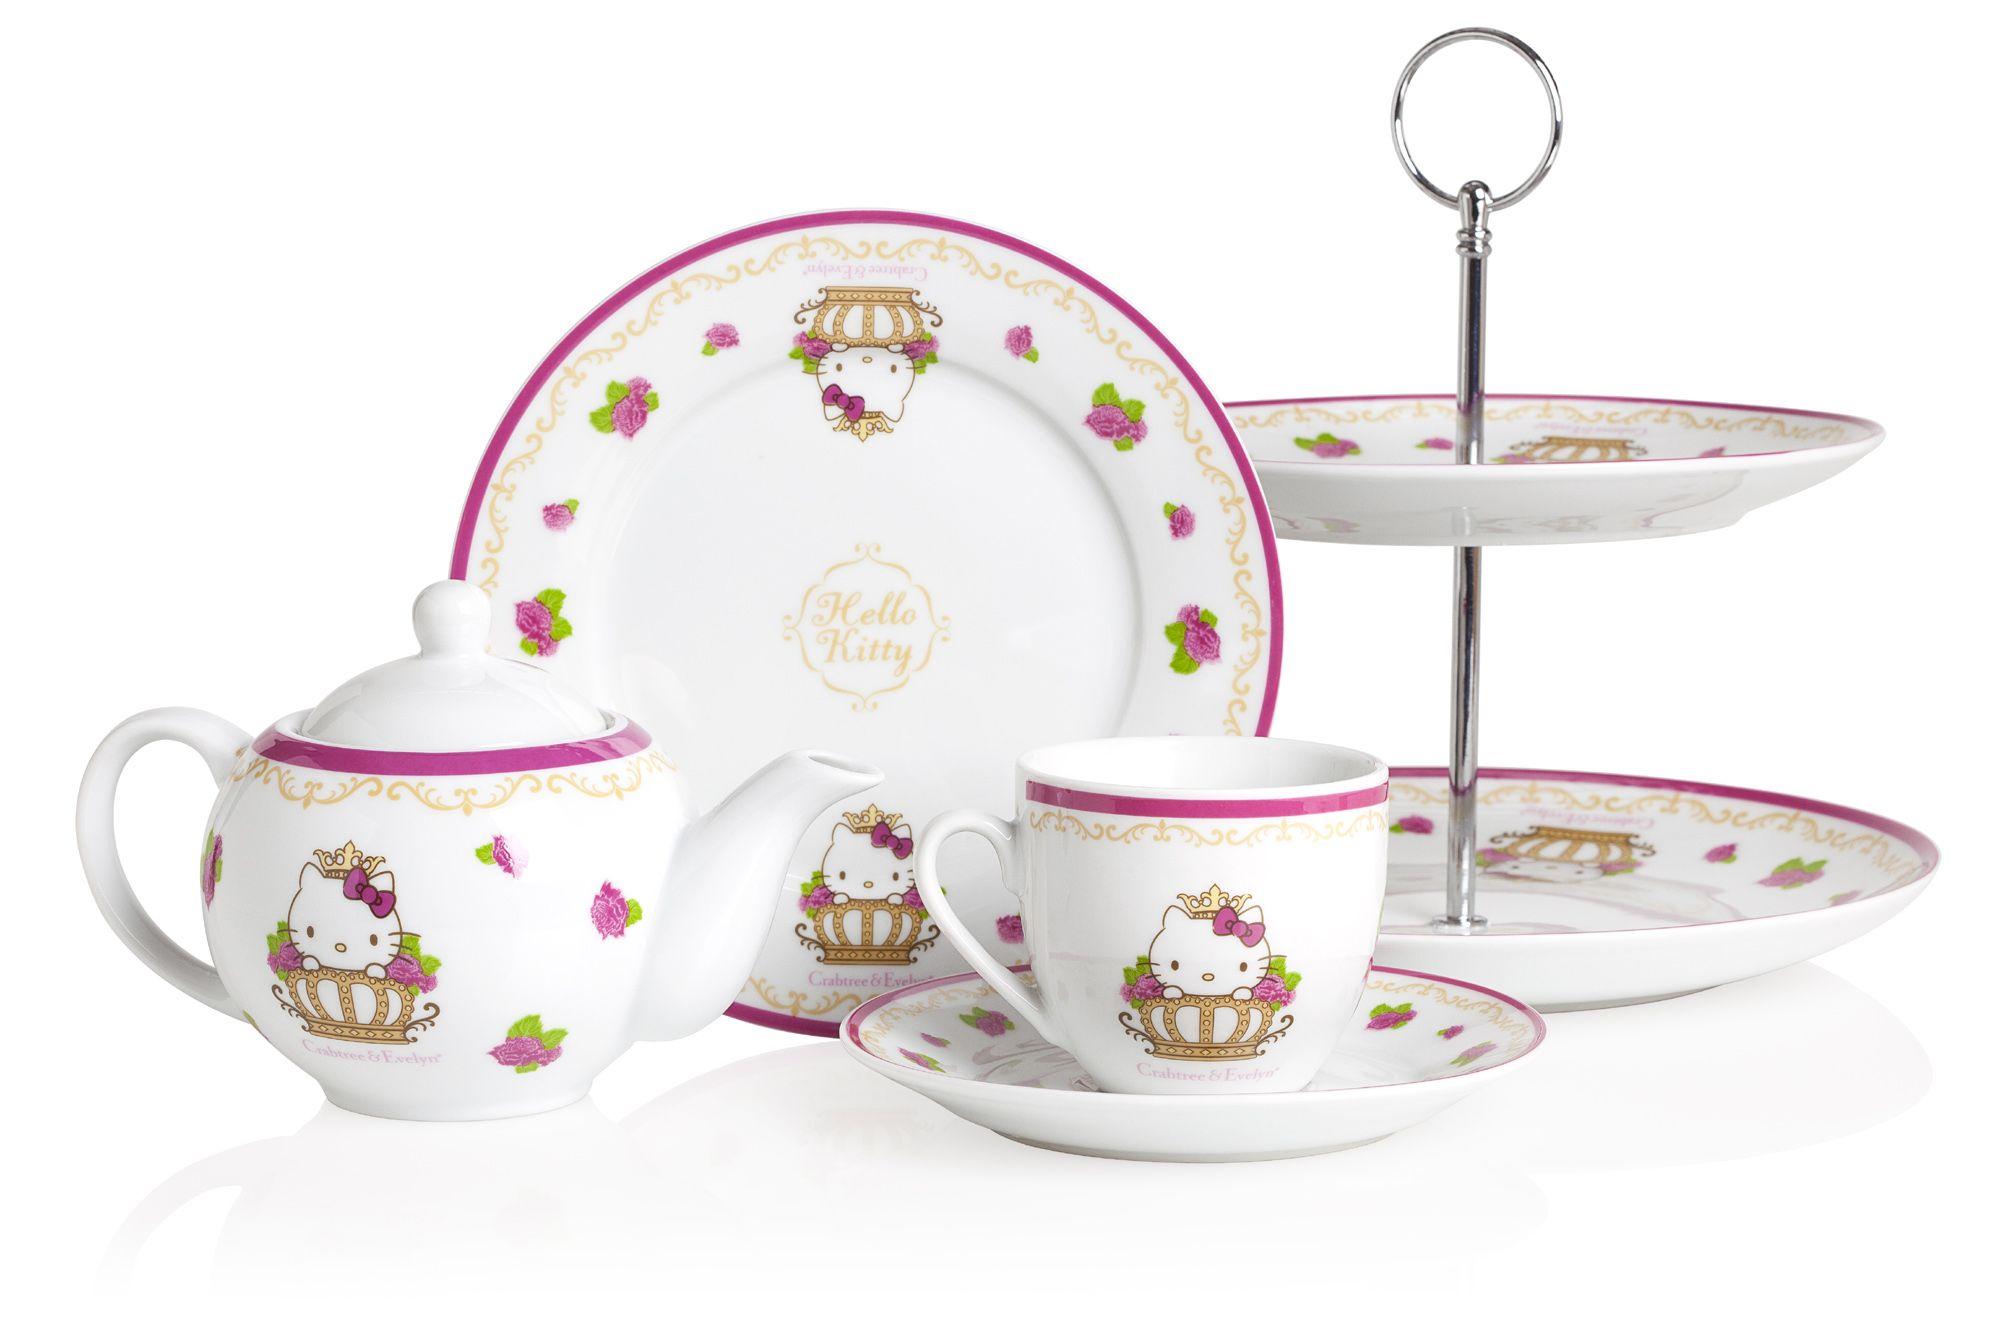 hellokitty tea set by Crabtree & Evelyn! (via feveravenue.com ...